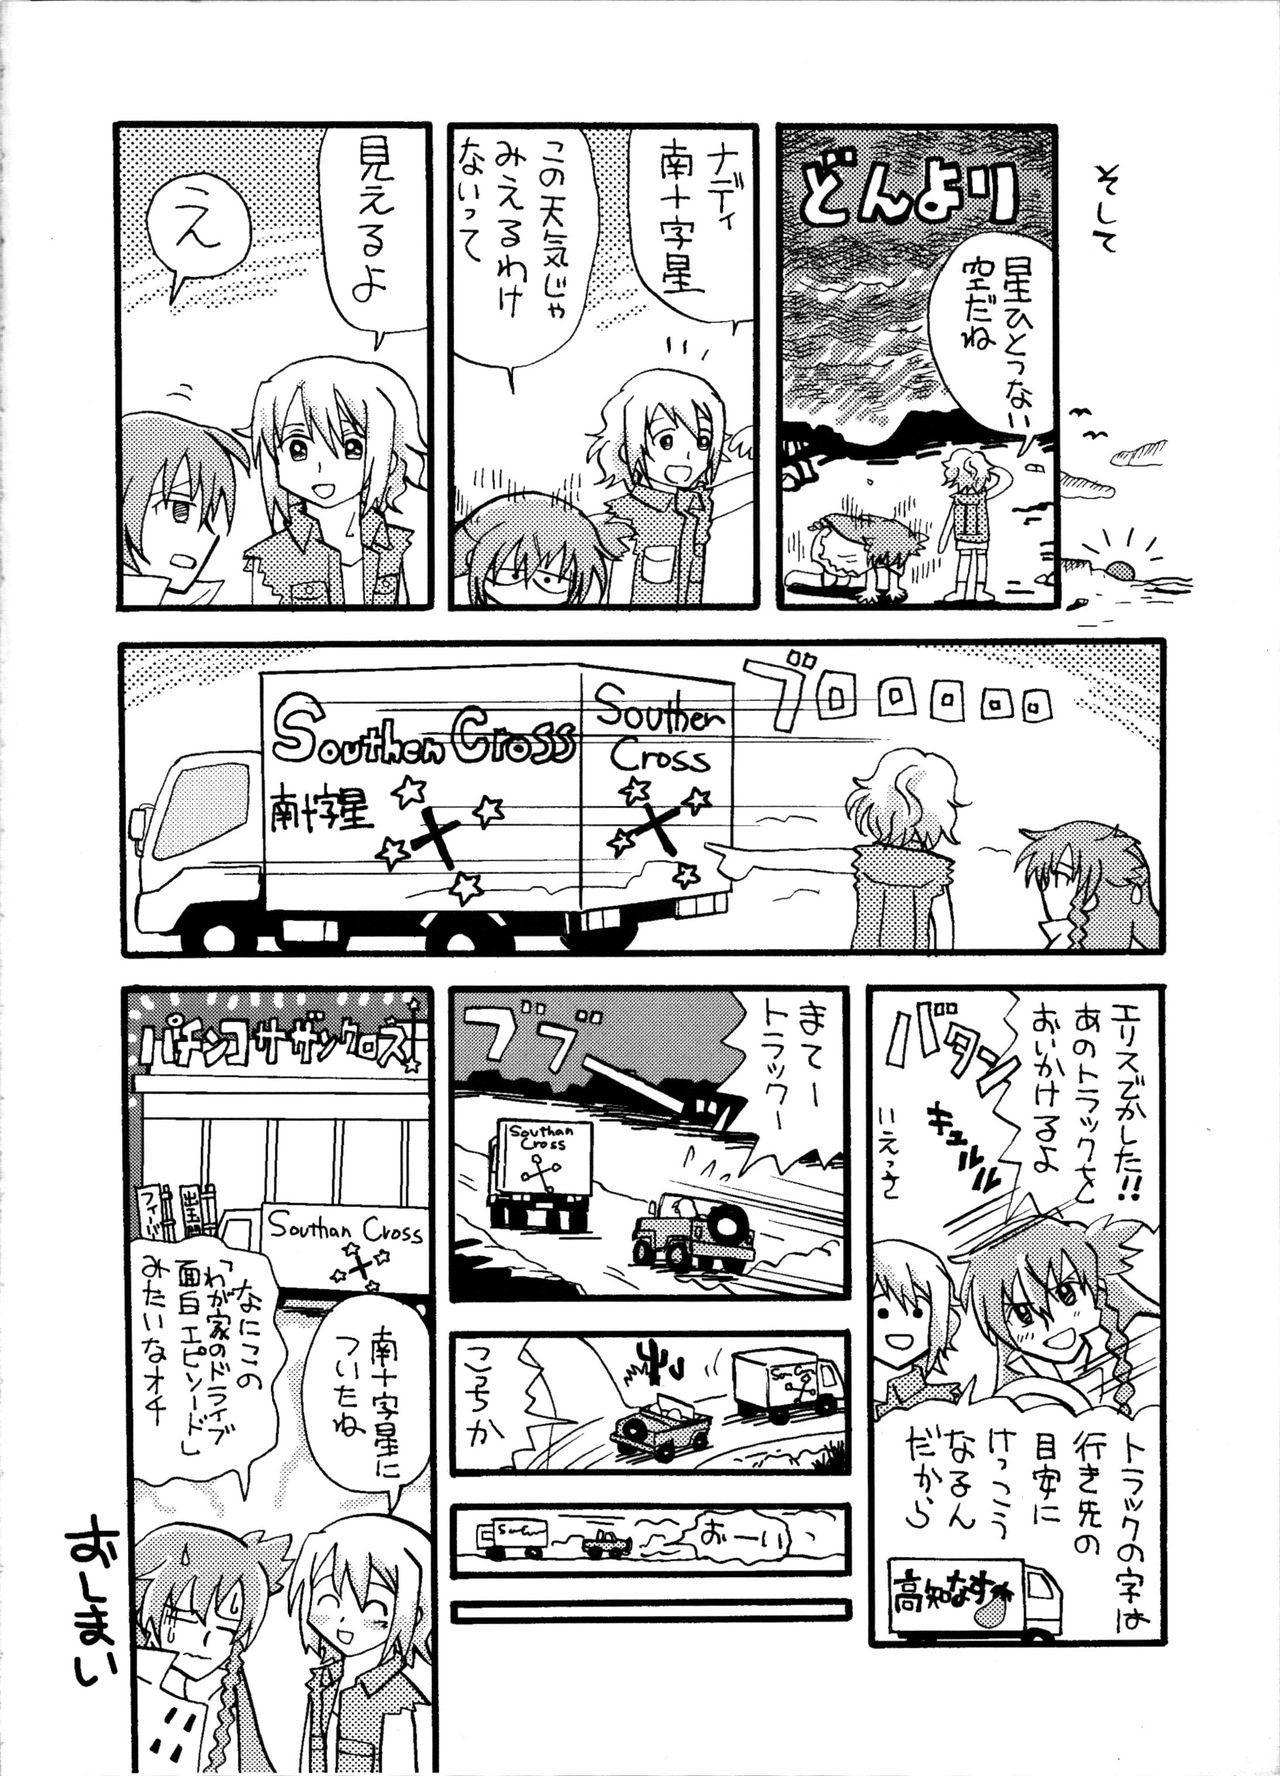 Minamikaze no Yukue 18